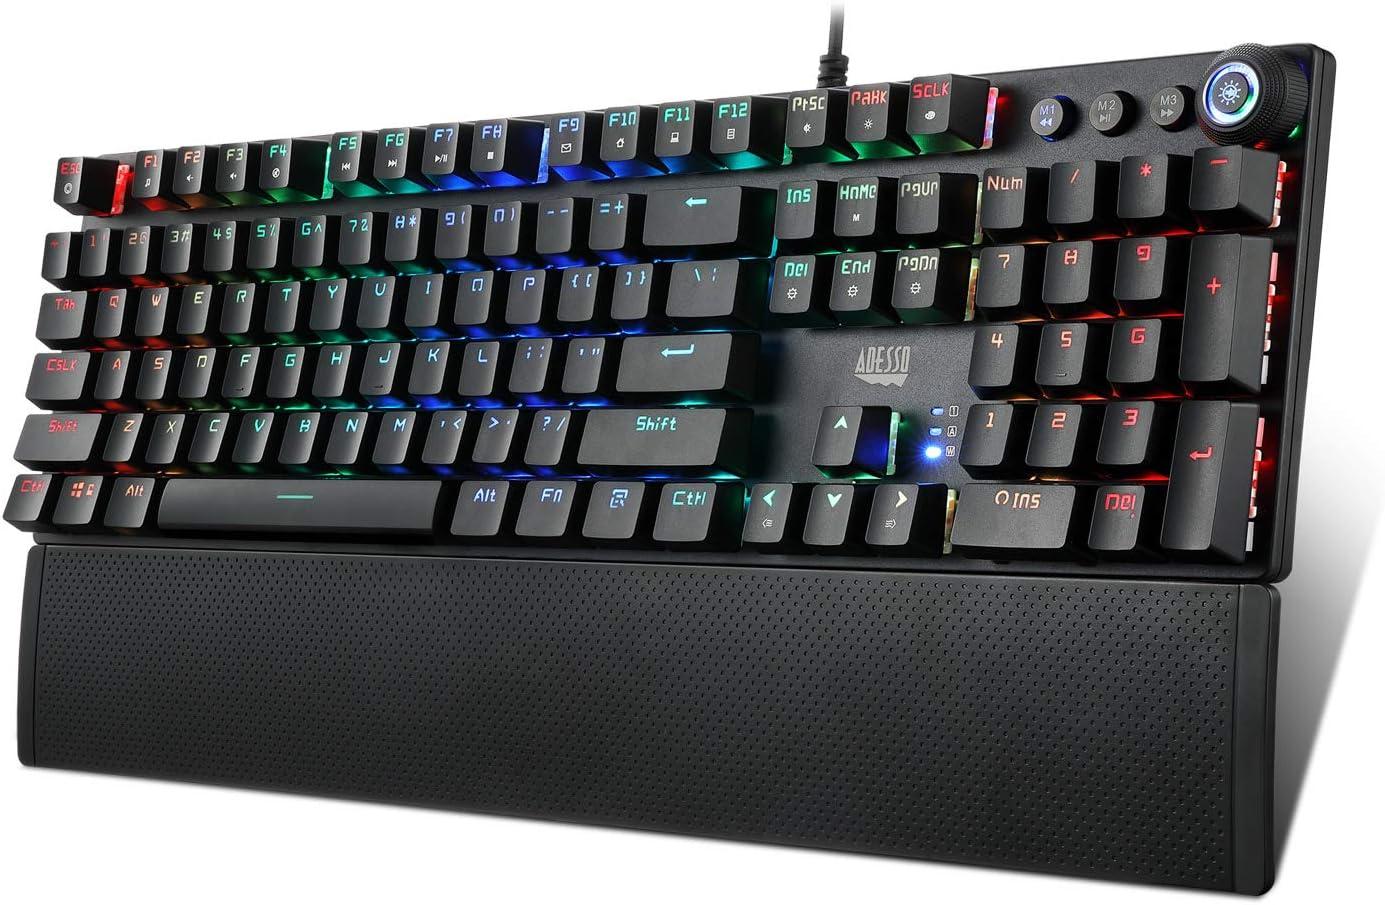 Adesso AKB-650EB Programmable Mechanical Gaming Keyboard